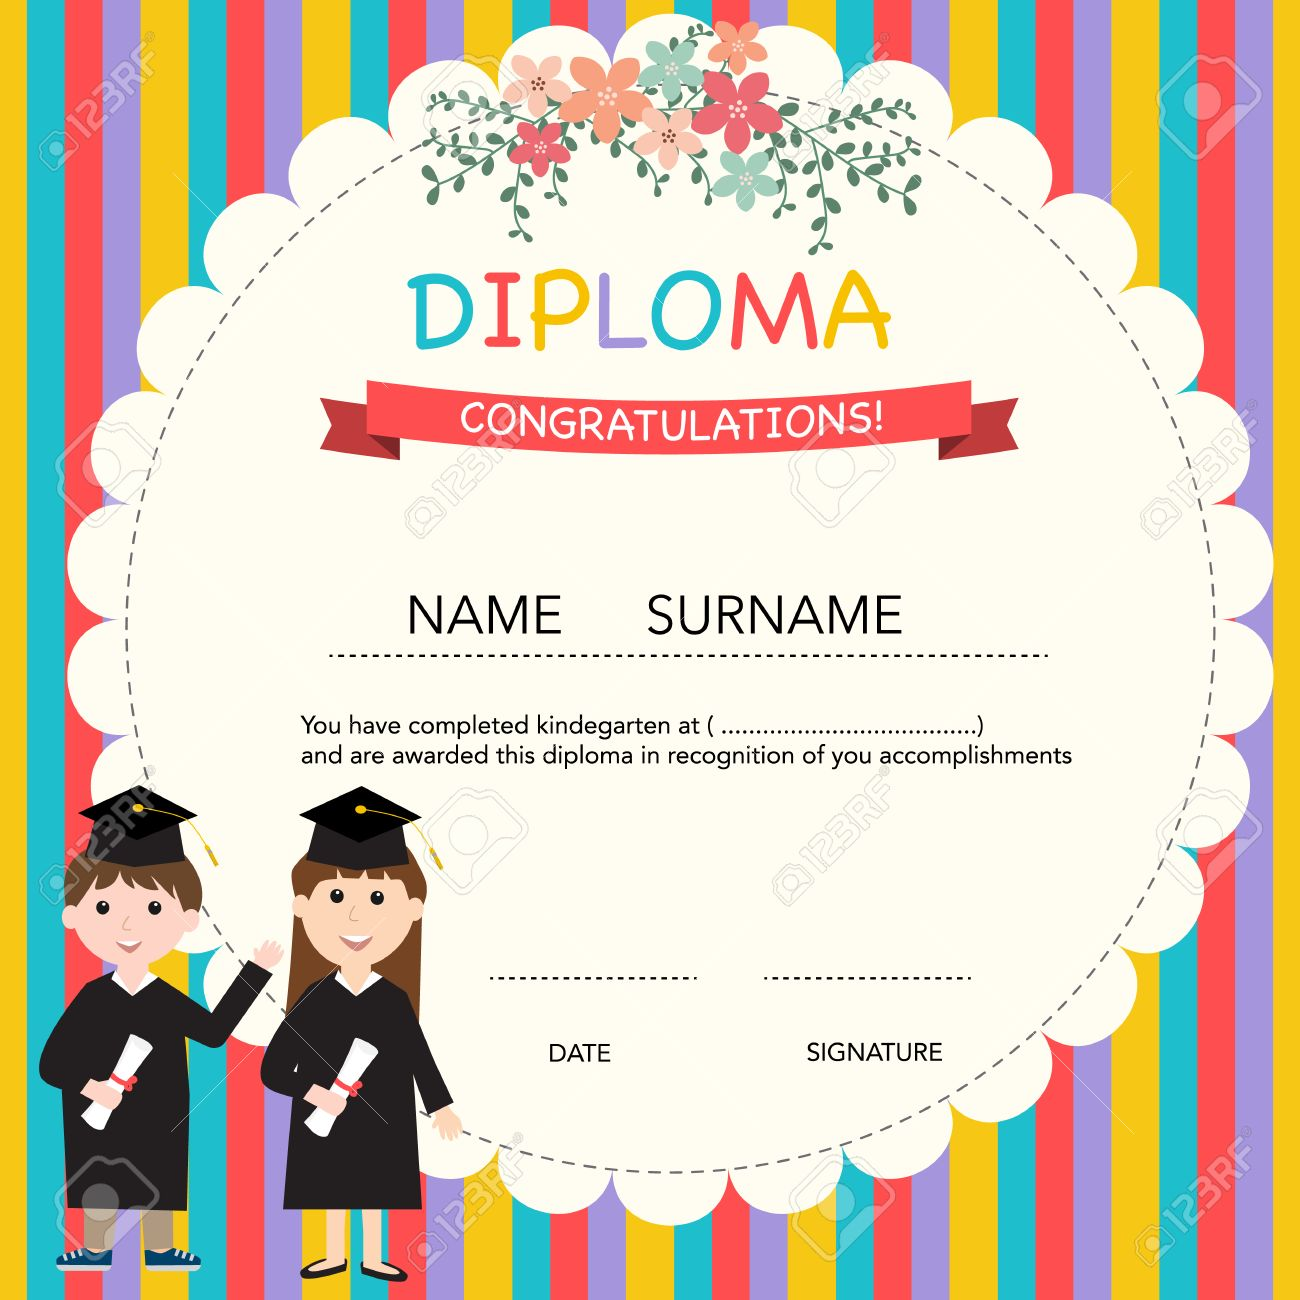 Kids certificate template eliolera certificate of kids diploma preschool kindergarten template yadclub Choice Image